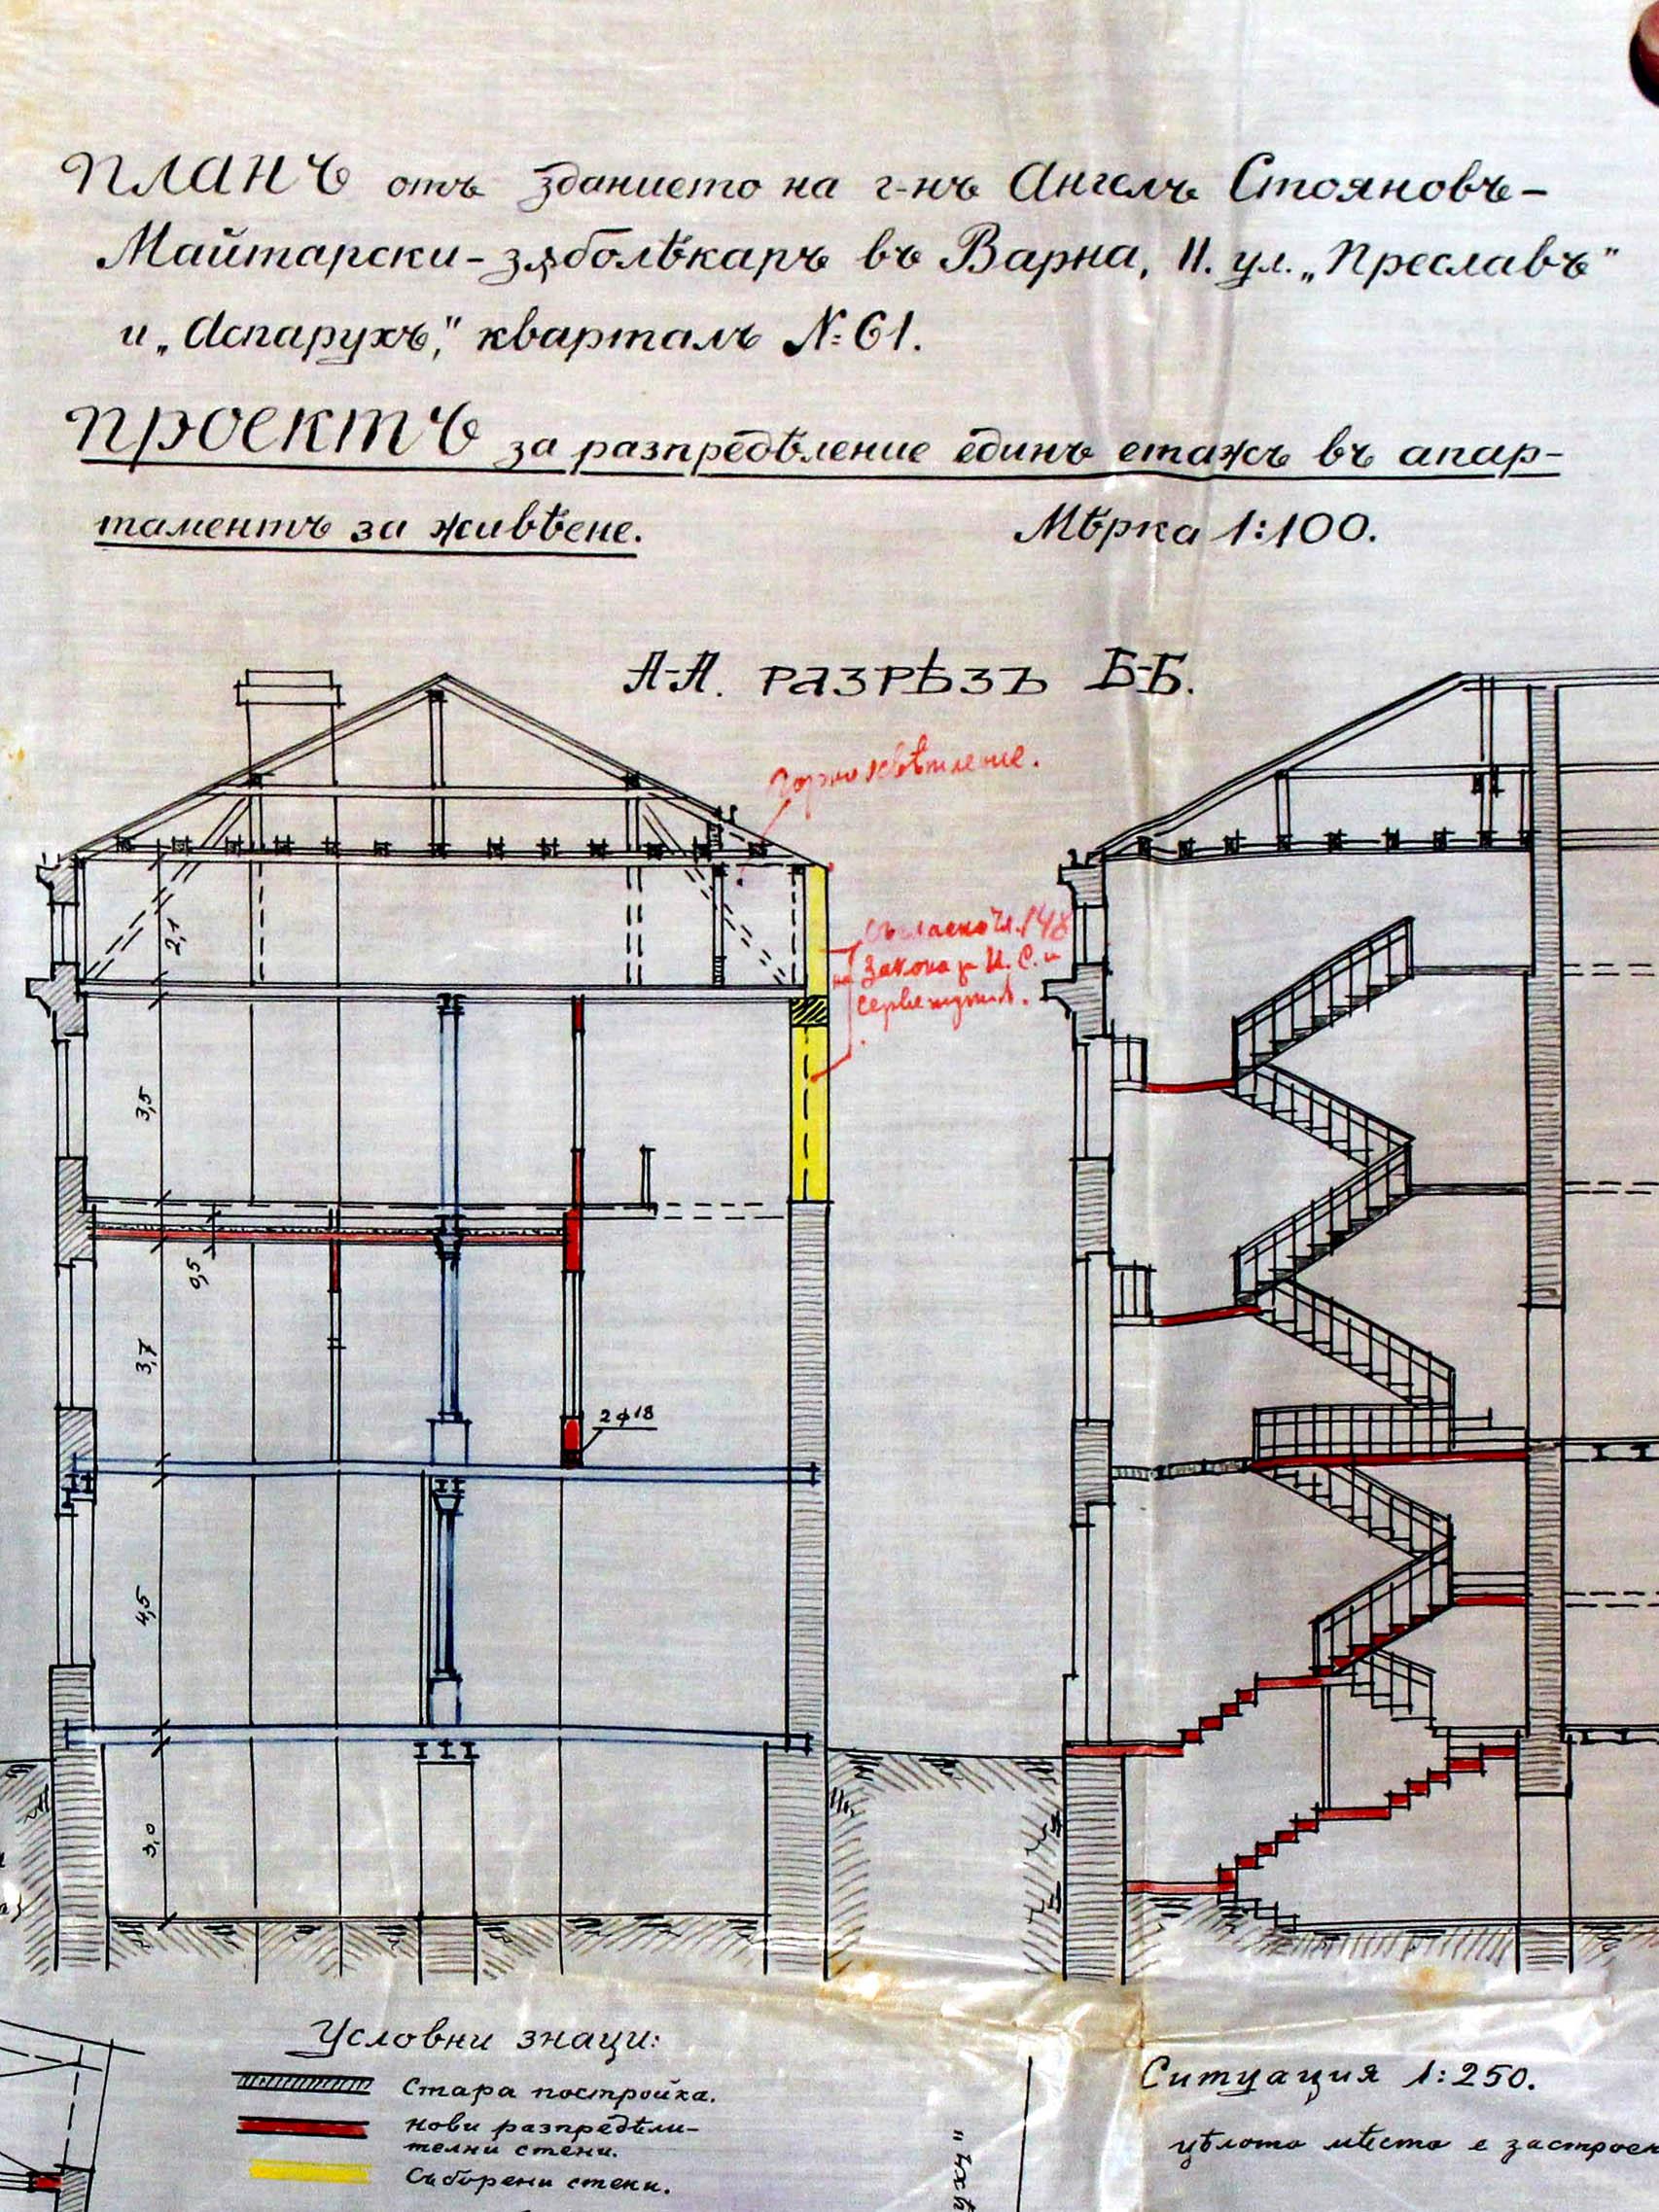 Проект за преустройство - 1931г. /изт.: Архив-Община Варна/